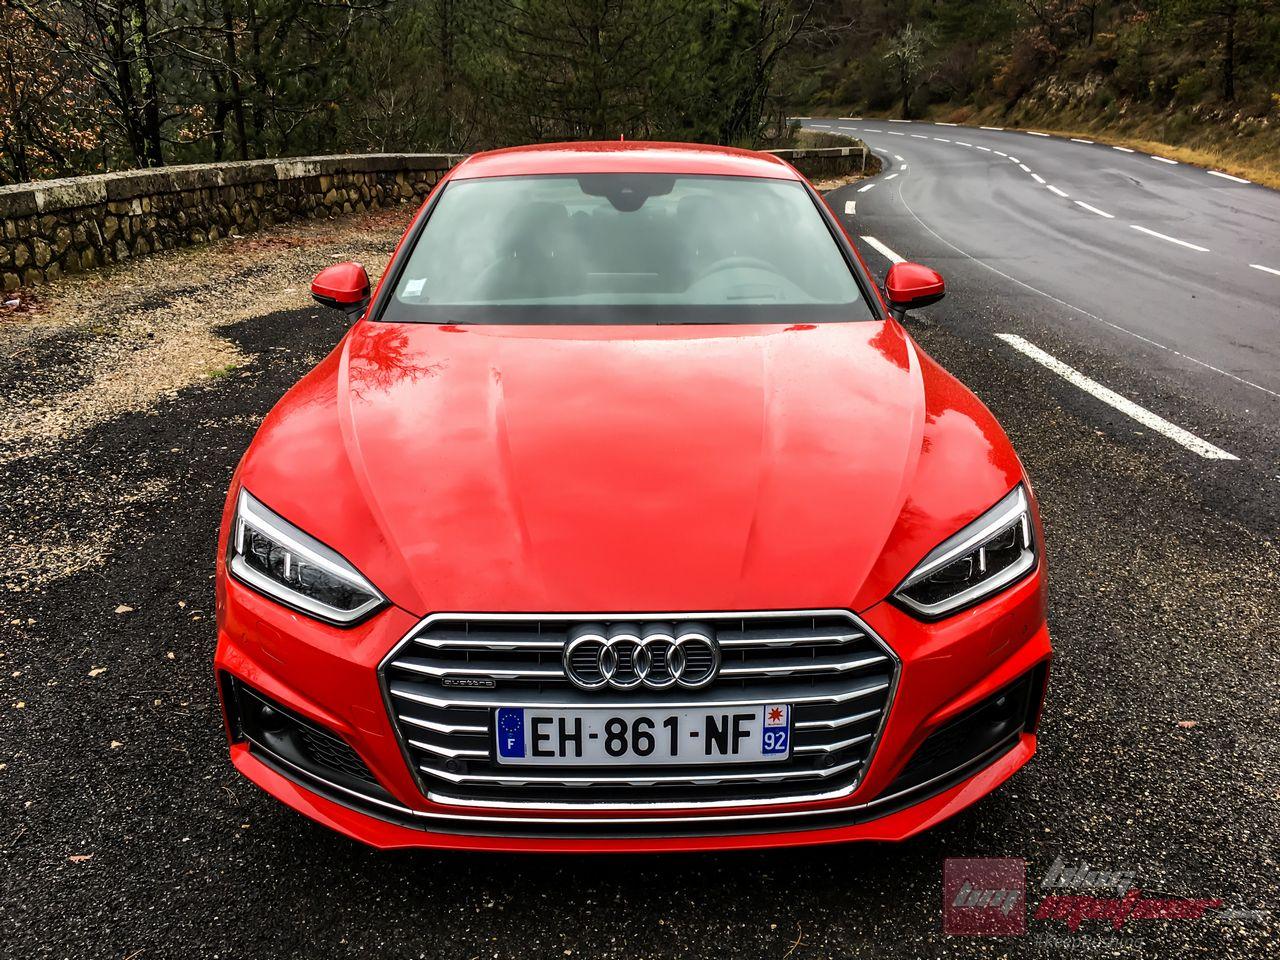 Audi_A5_S5-12